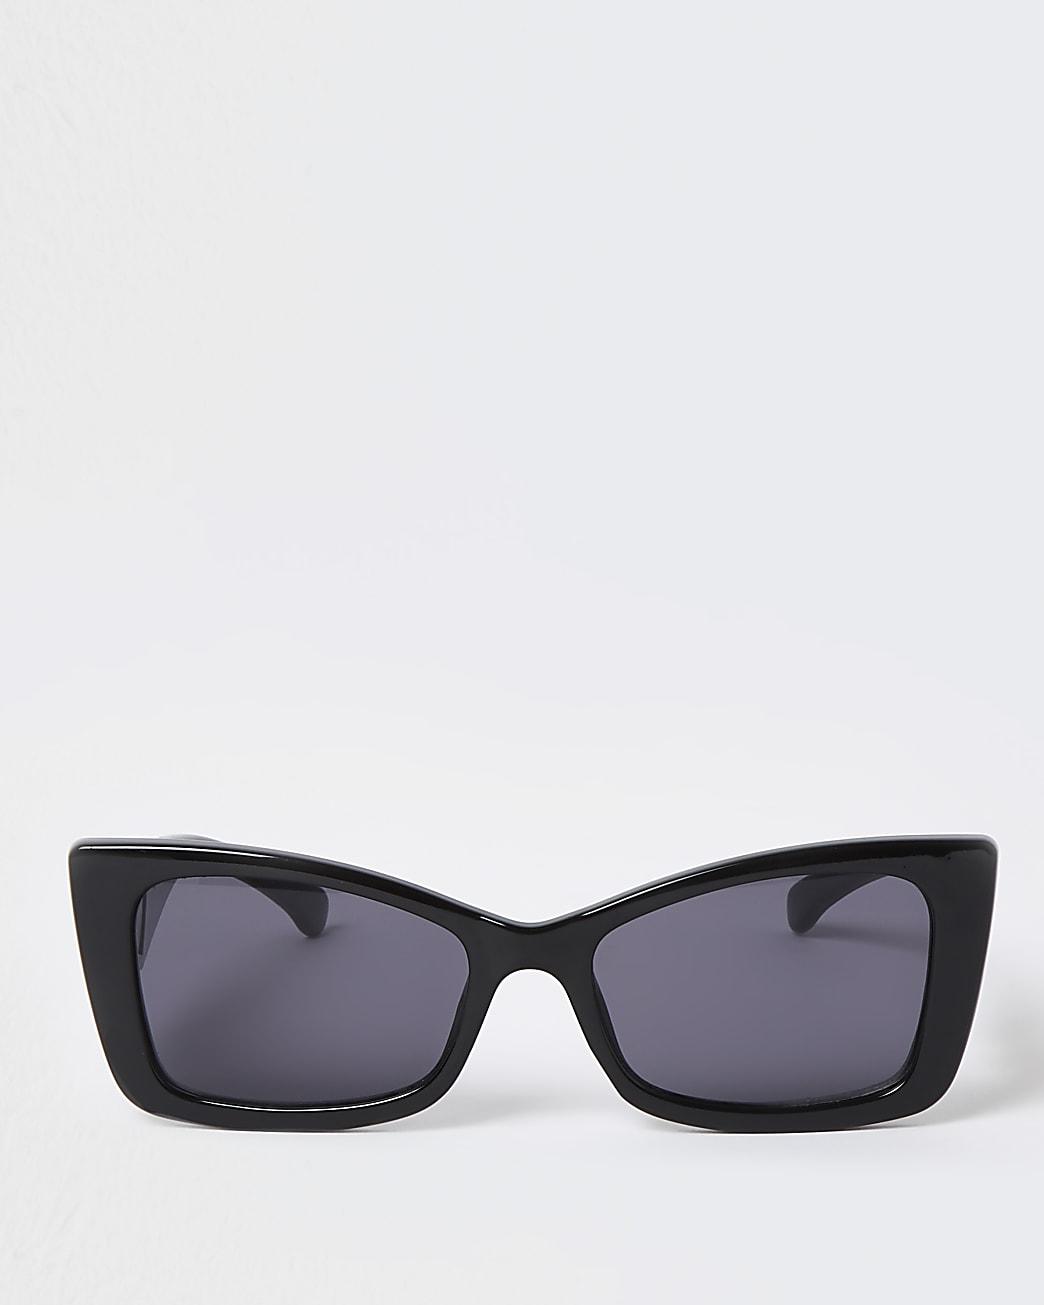 Black flared cat eye sunglasses